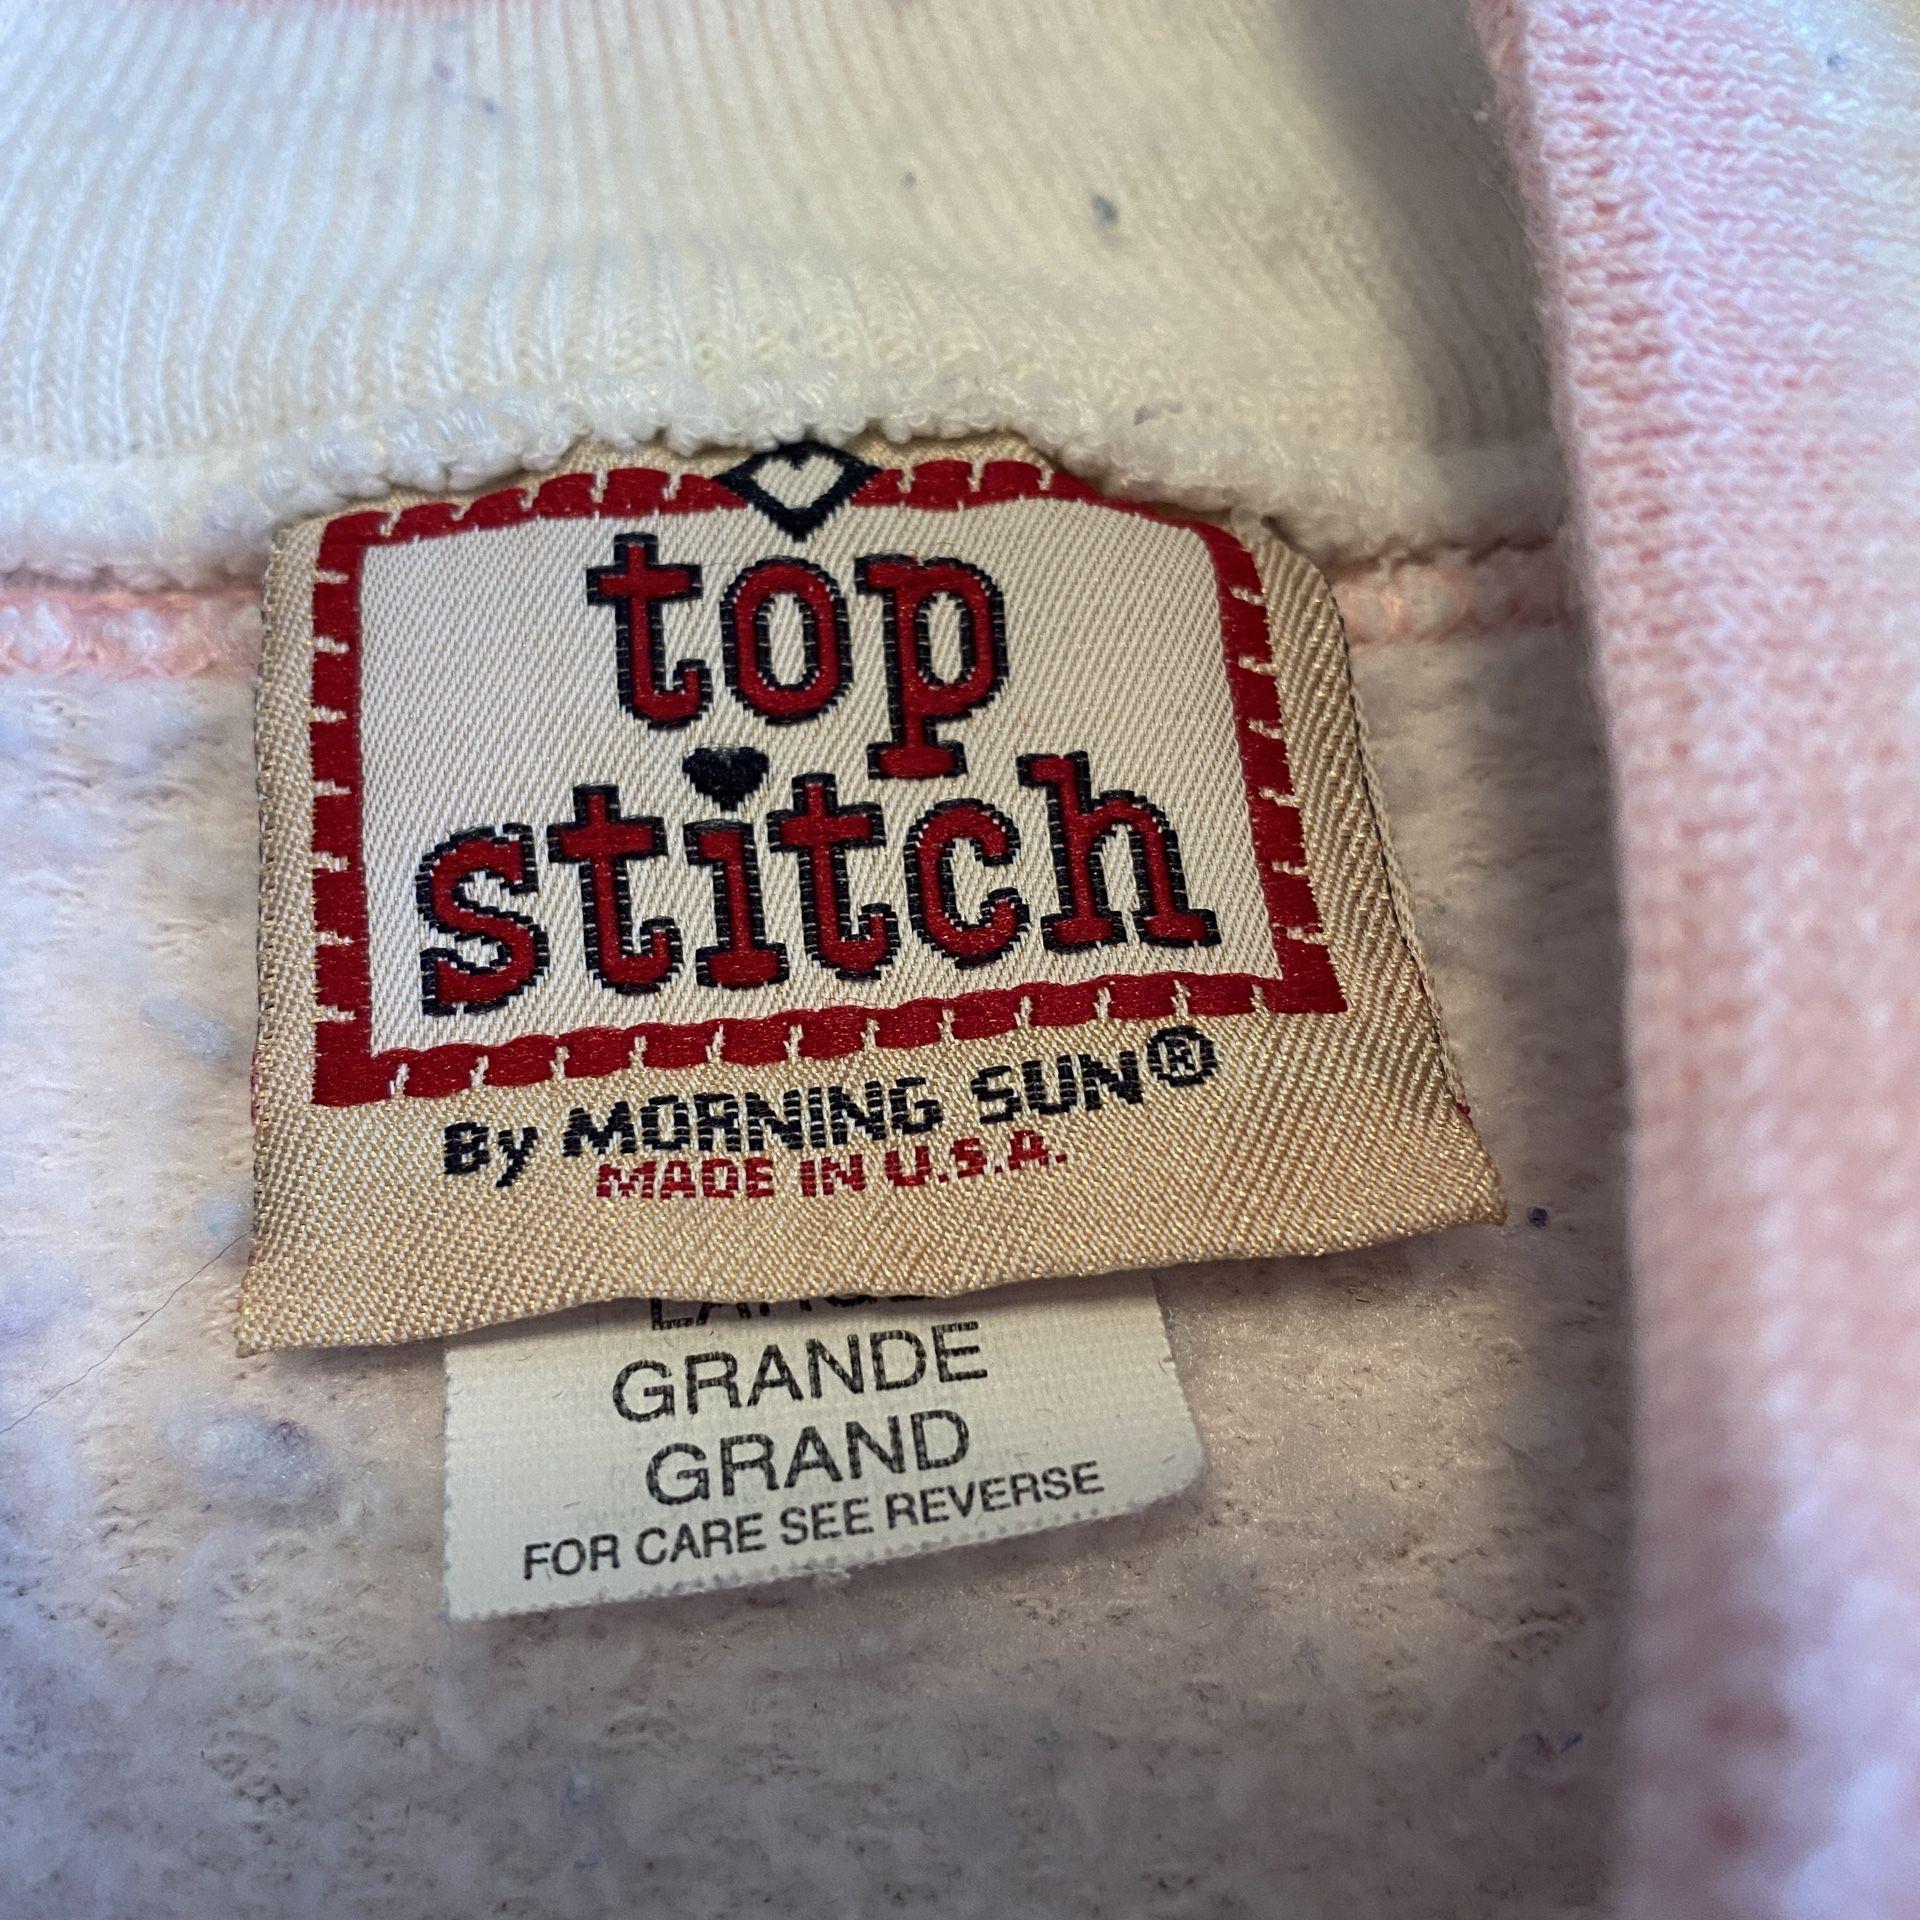 VTG Top Stitch Morning Sun Pink Sweatshirt Heart Shrubs Grandma Sweater USA L